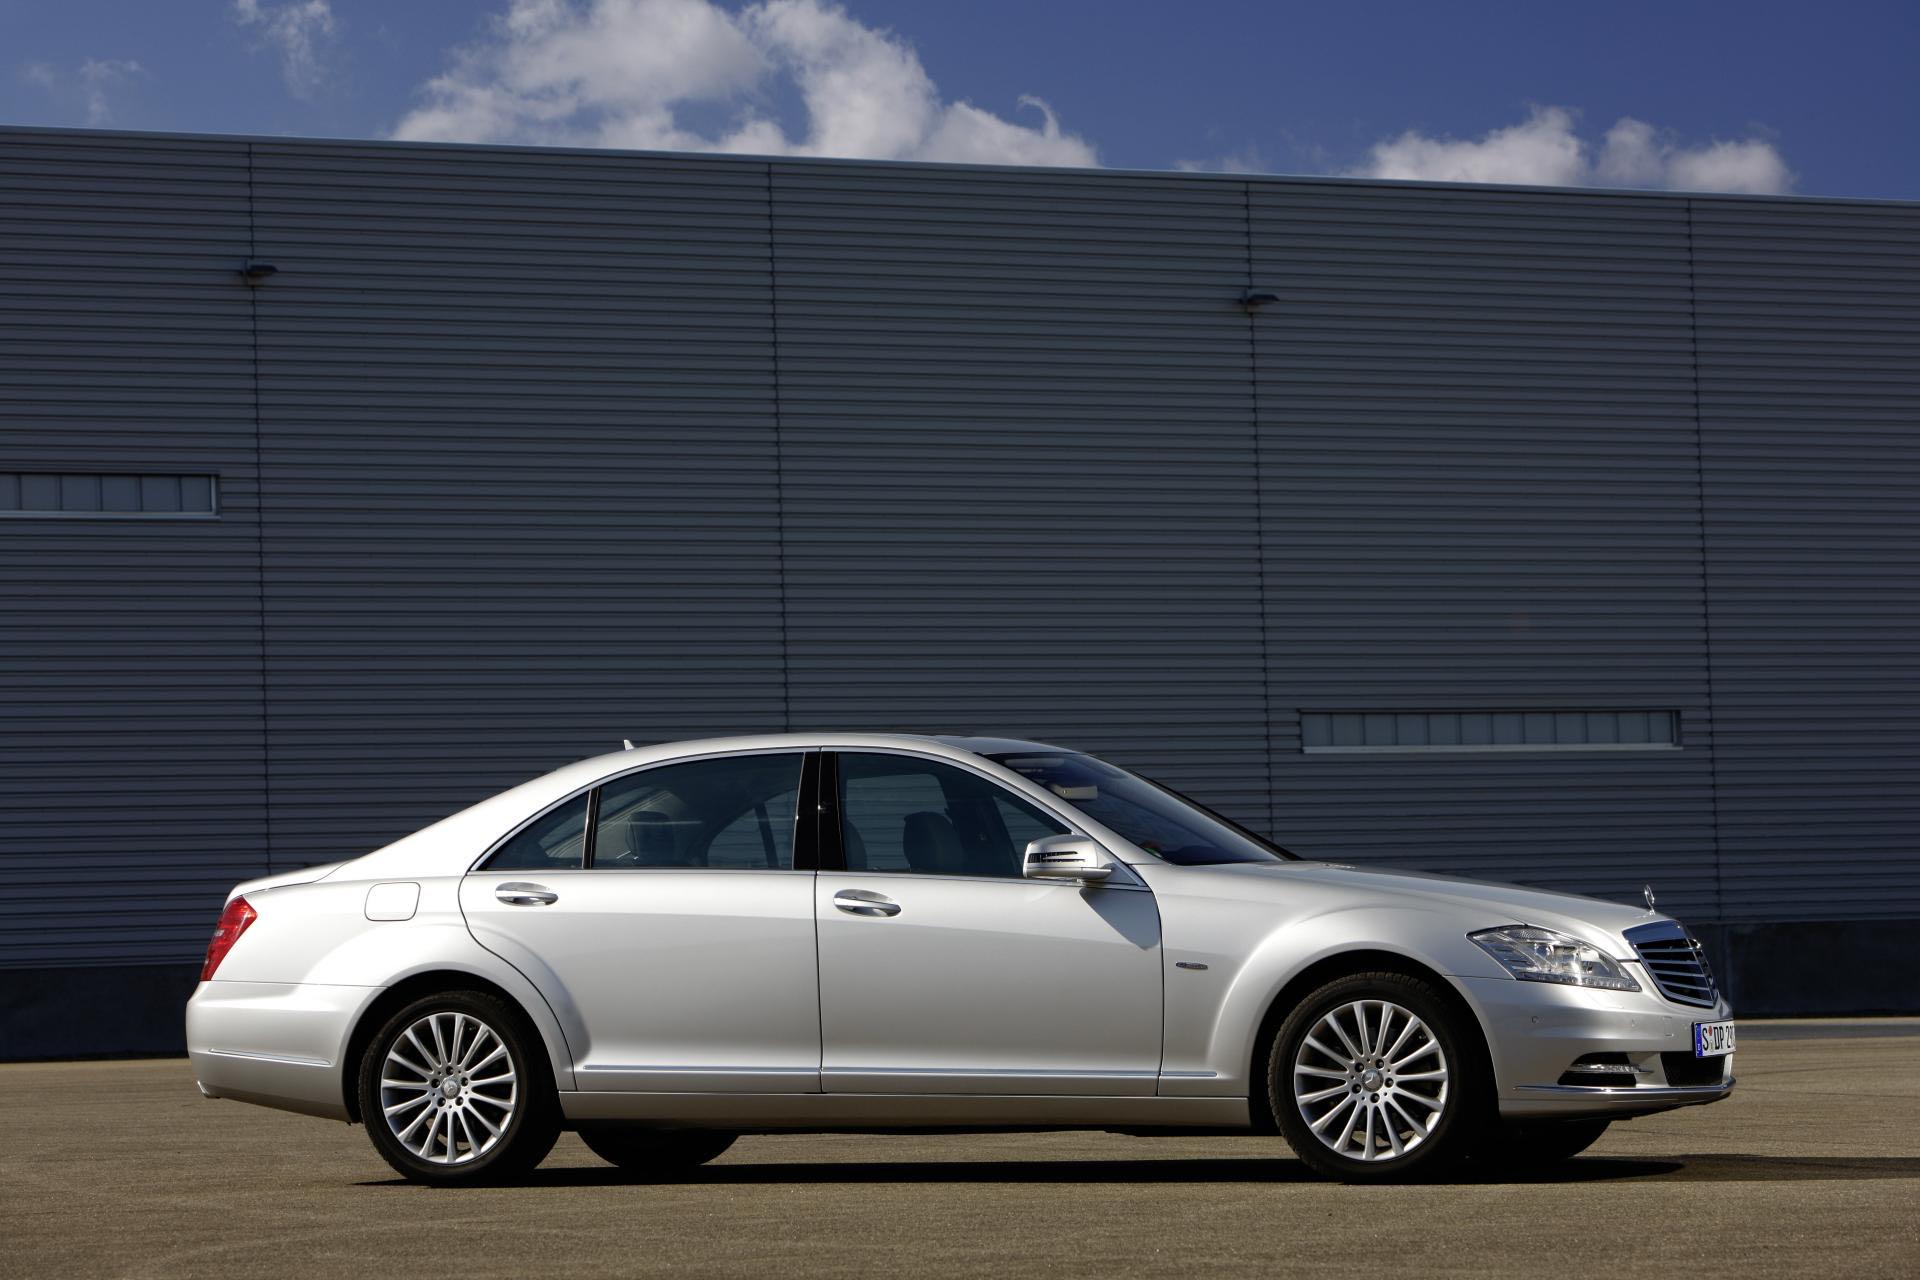 2012 Mercedes-Benz S-Class - conceptcarz.com